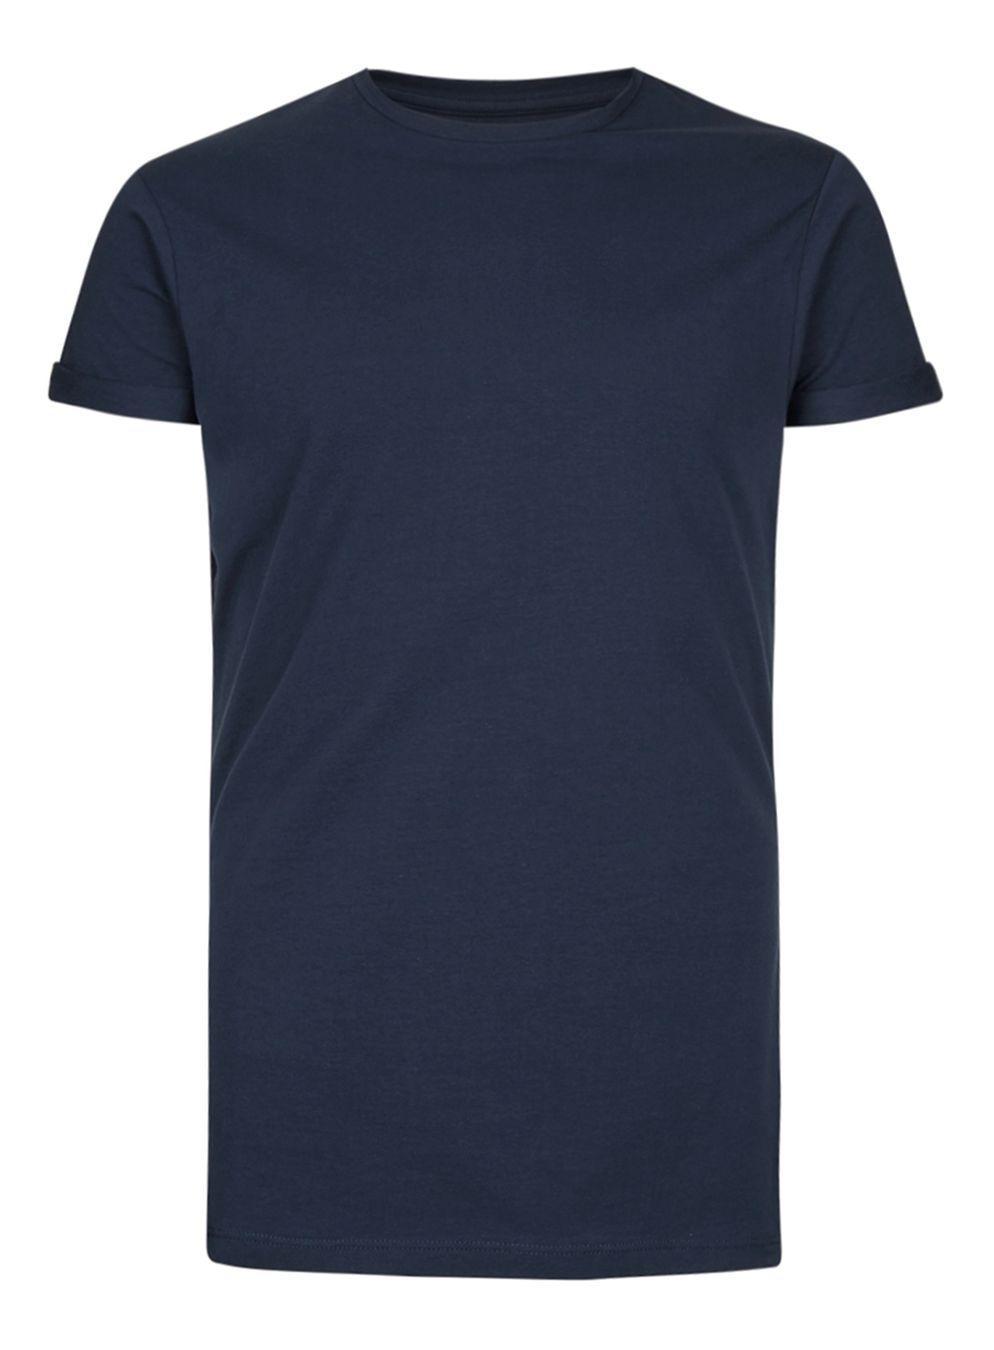 1d3aa61e394 Lyst - Topman Navy Ultra Muscle Roller T-shirt in Blue for Men